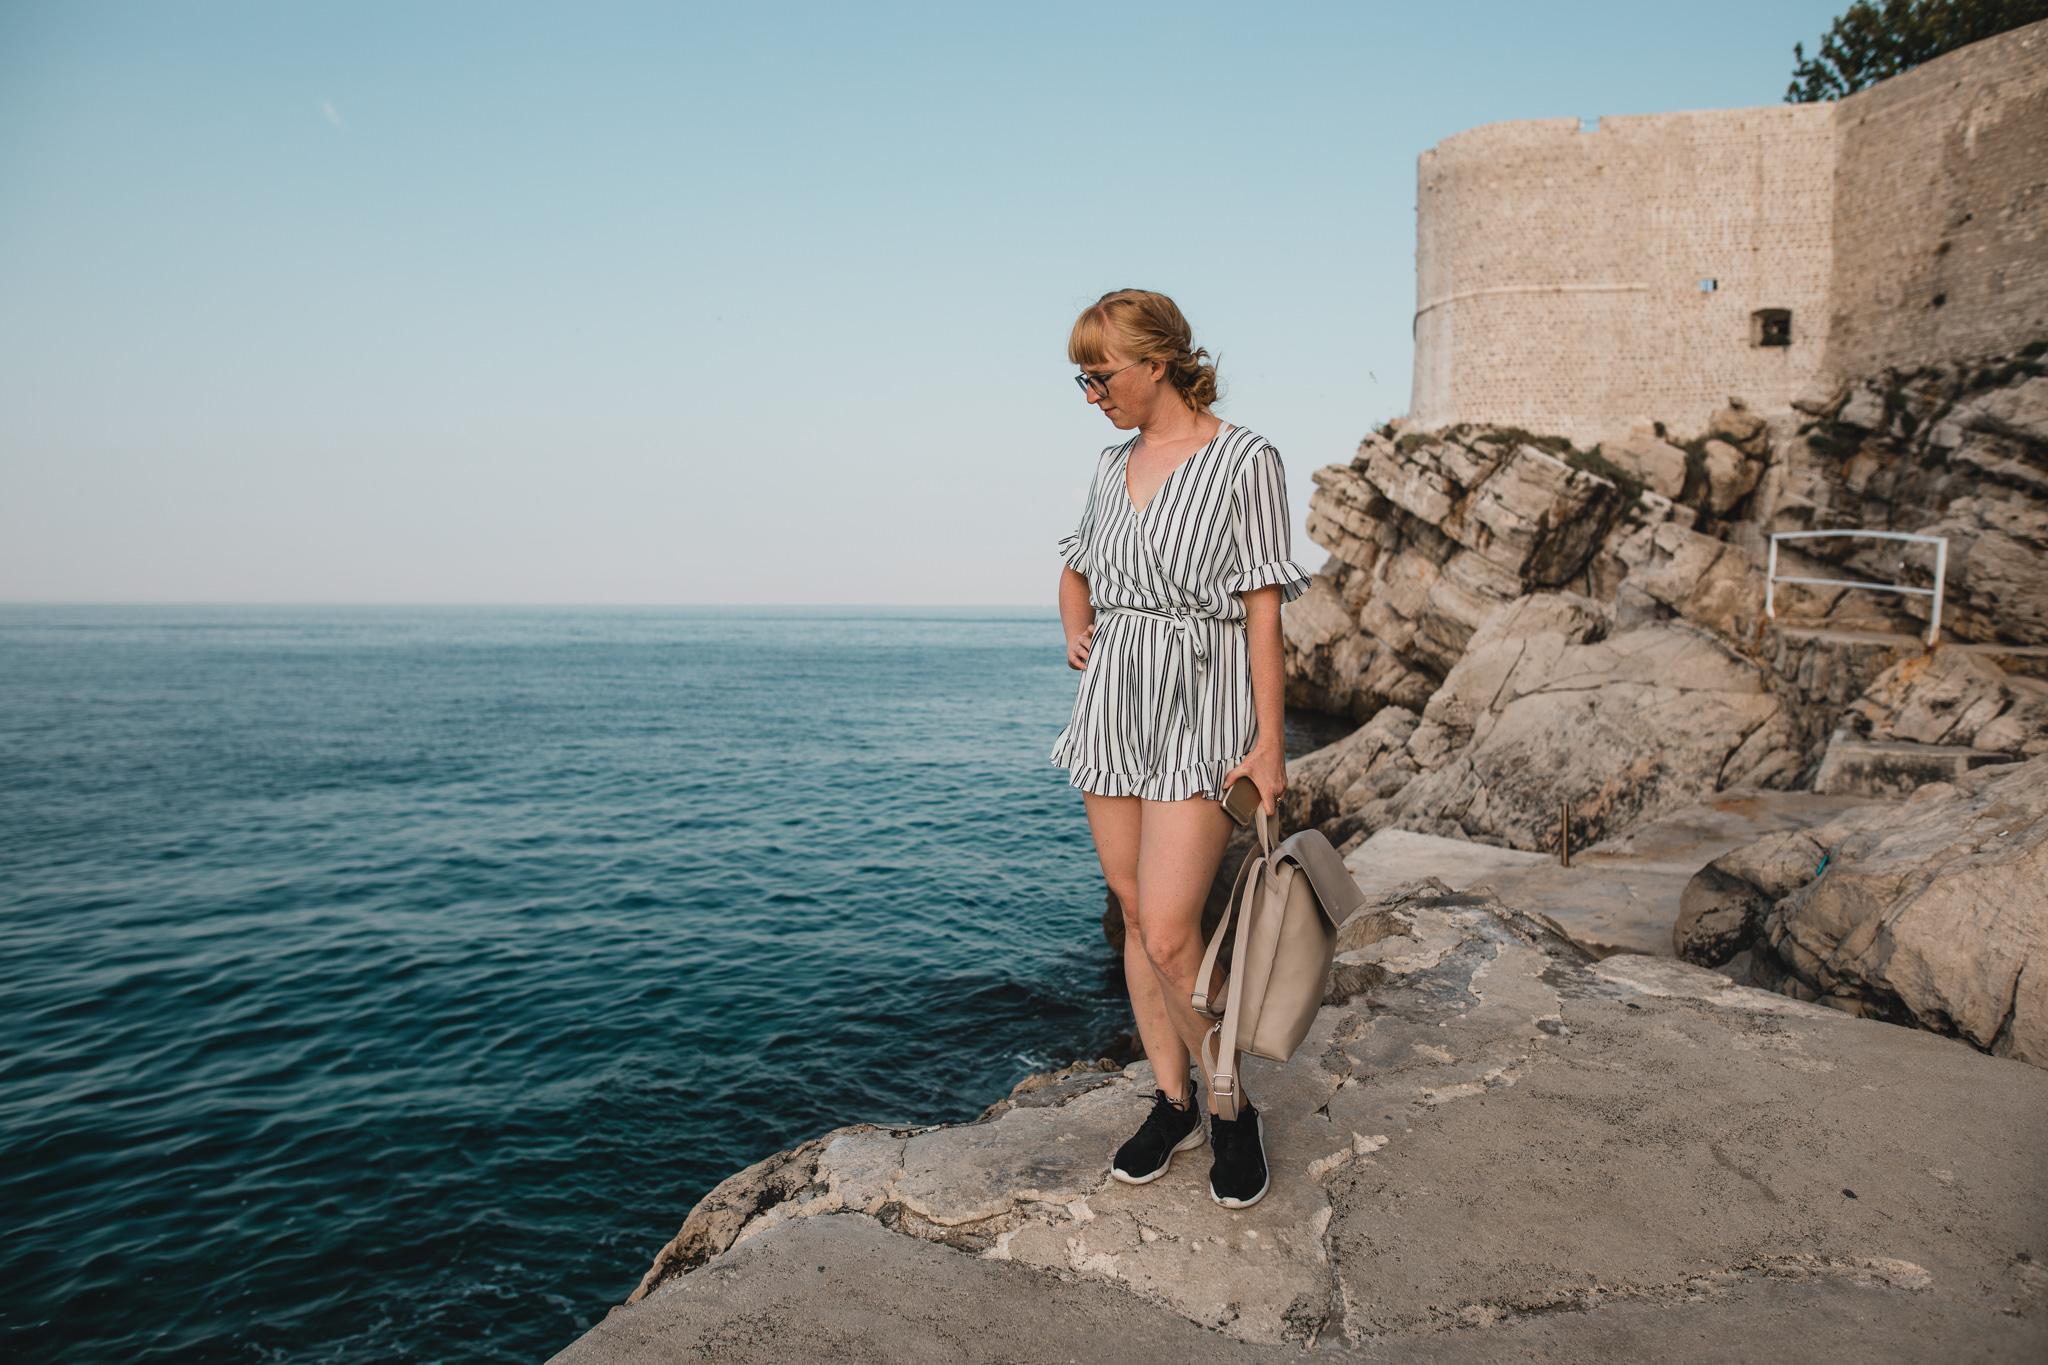 184-WEB-Jonathan-Kuhn-Photography-Croatia-1238.jpg